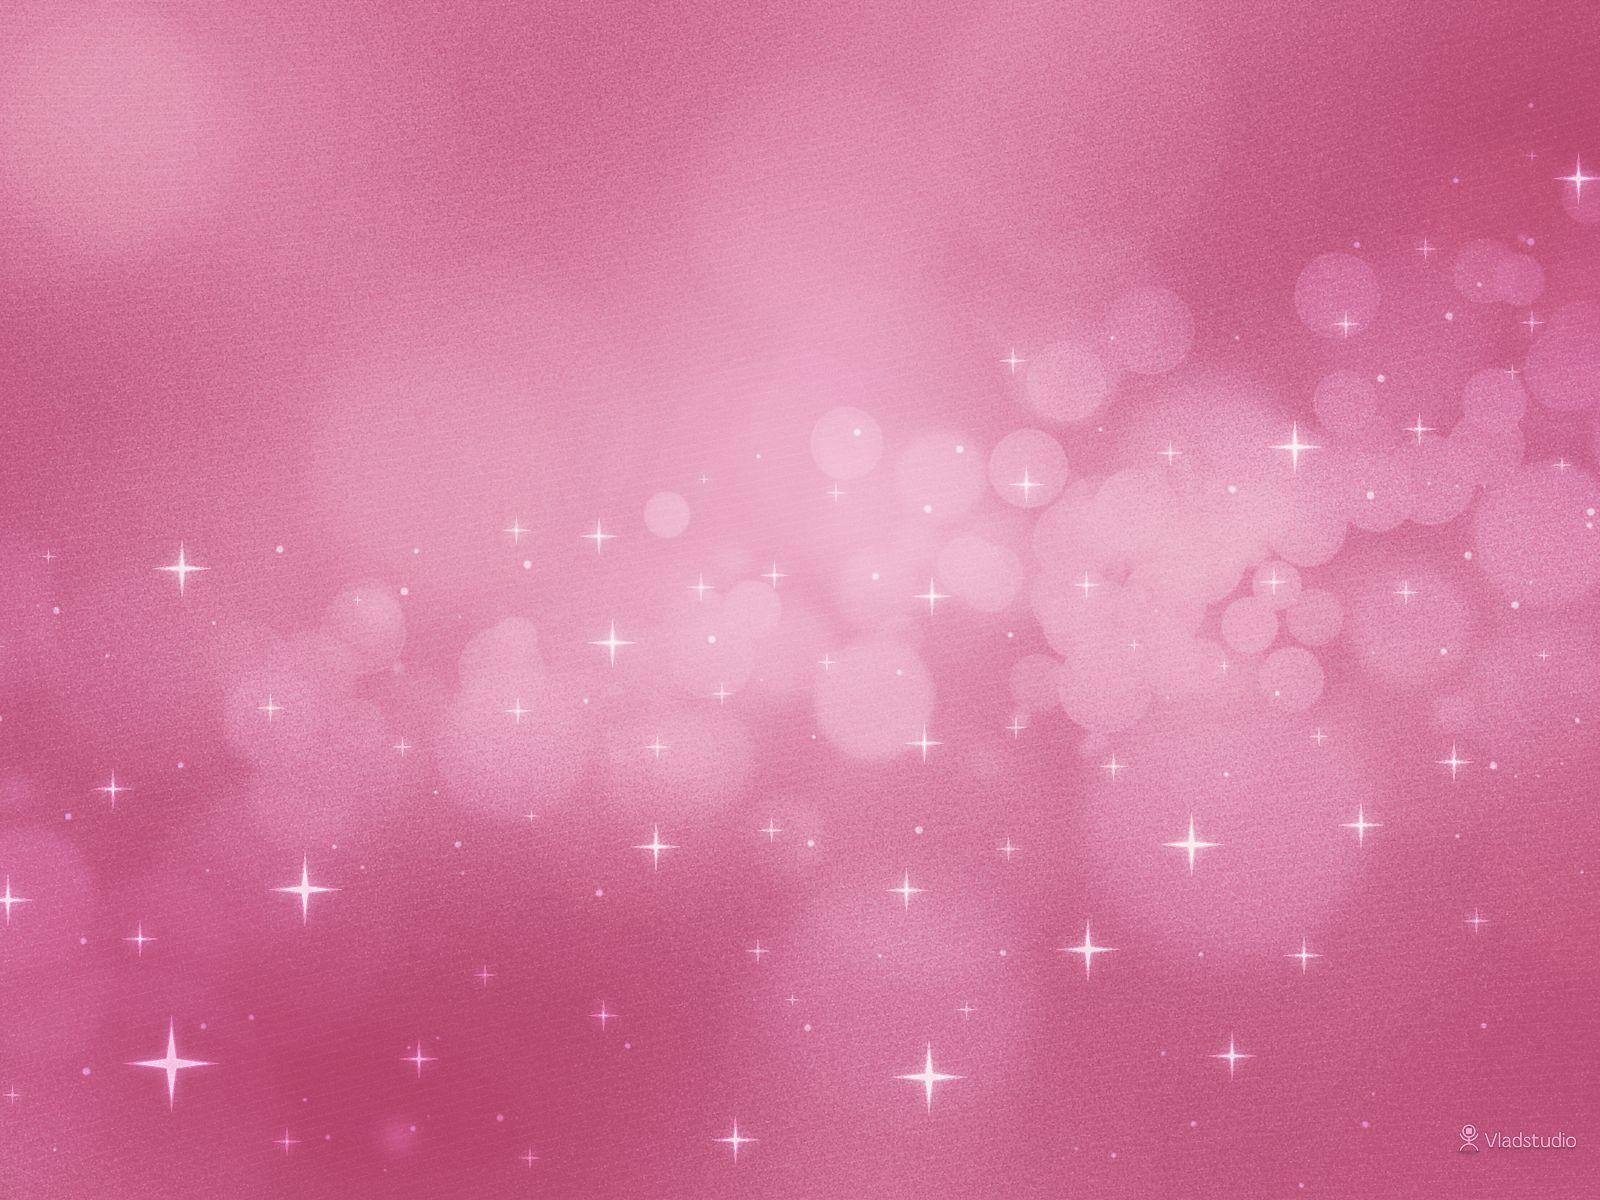 Pink fog clouds wallpaper 1600x1200 | Wallpaper Collection ...